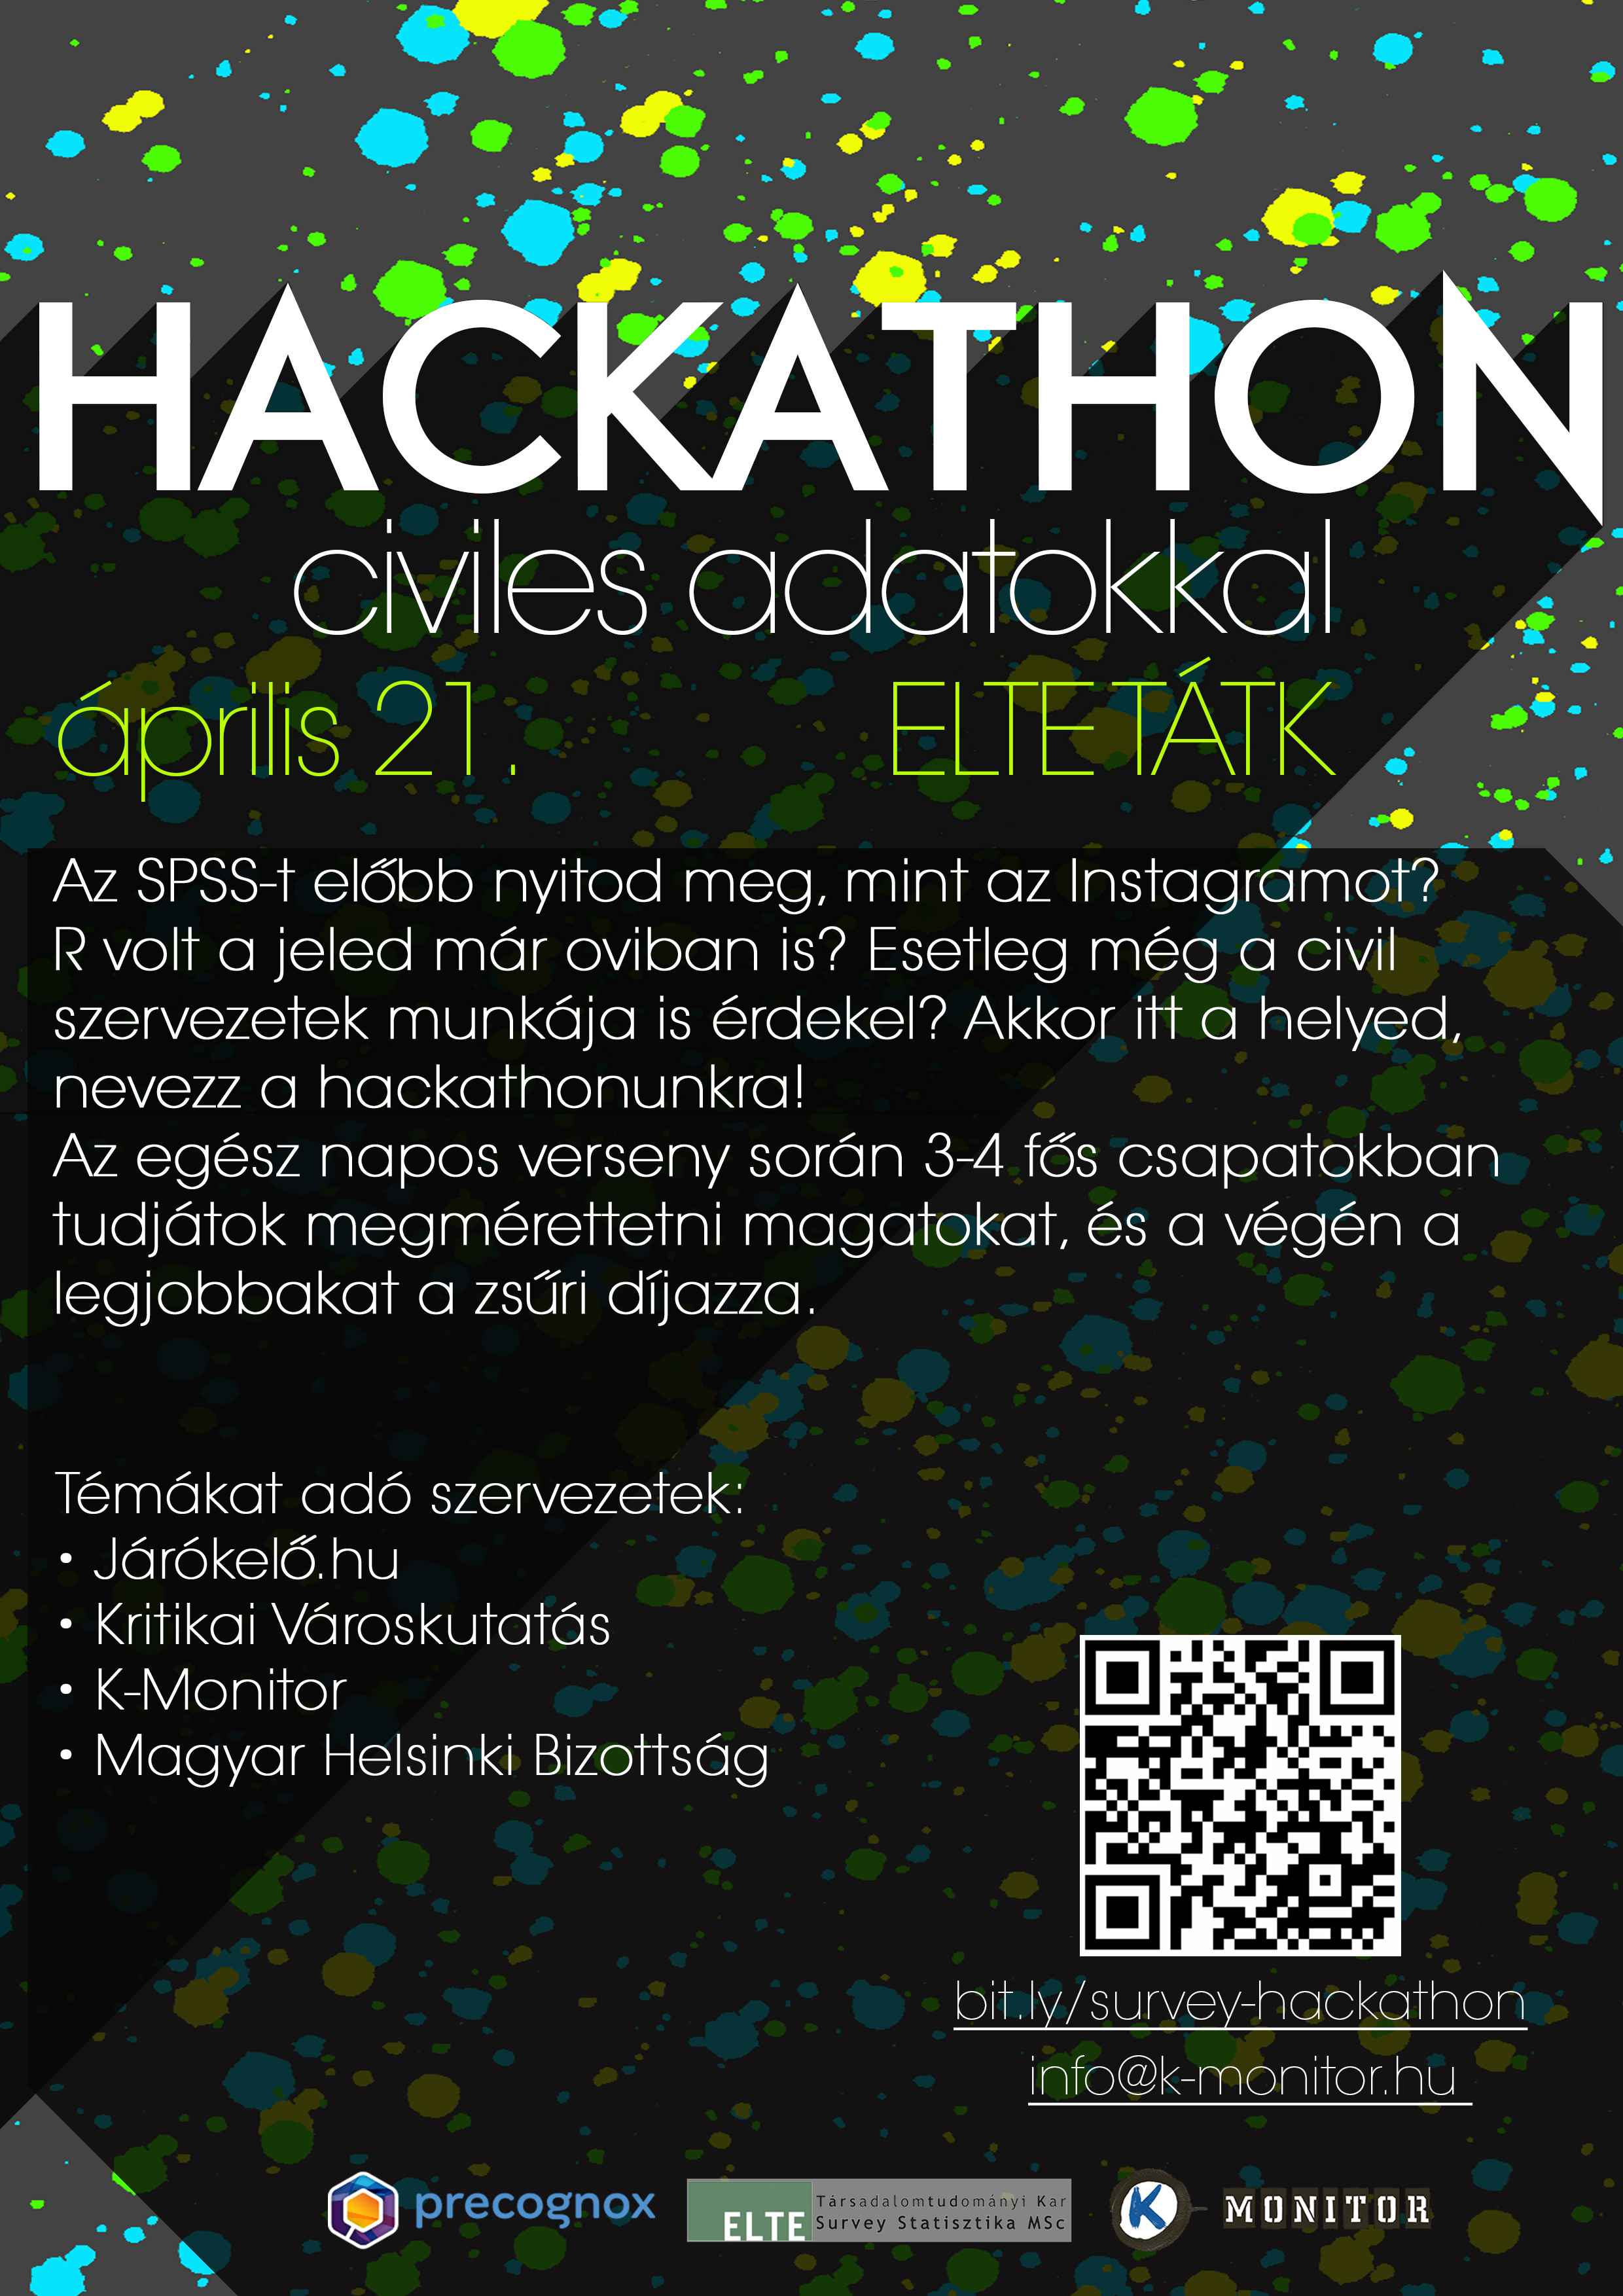 hackathon_a4_v6.jpg